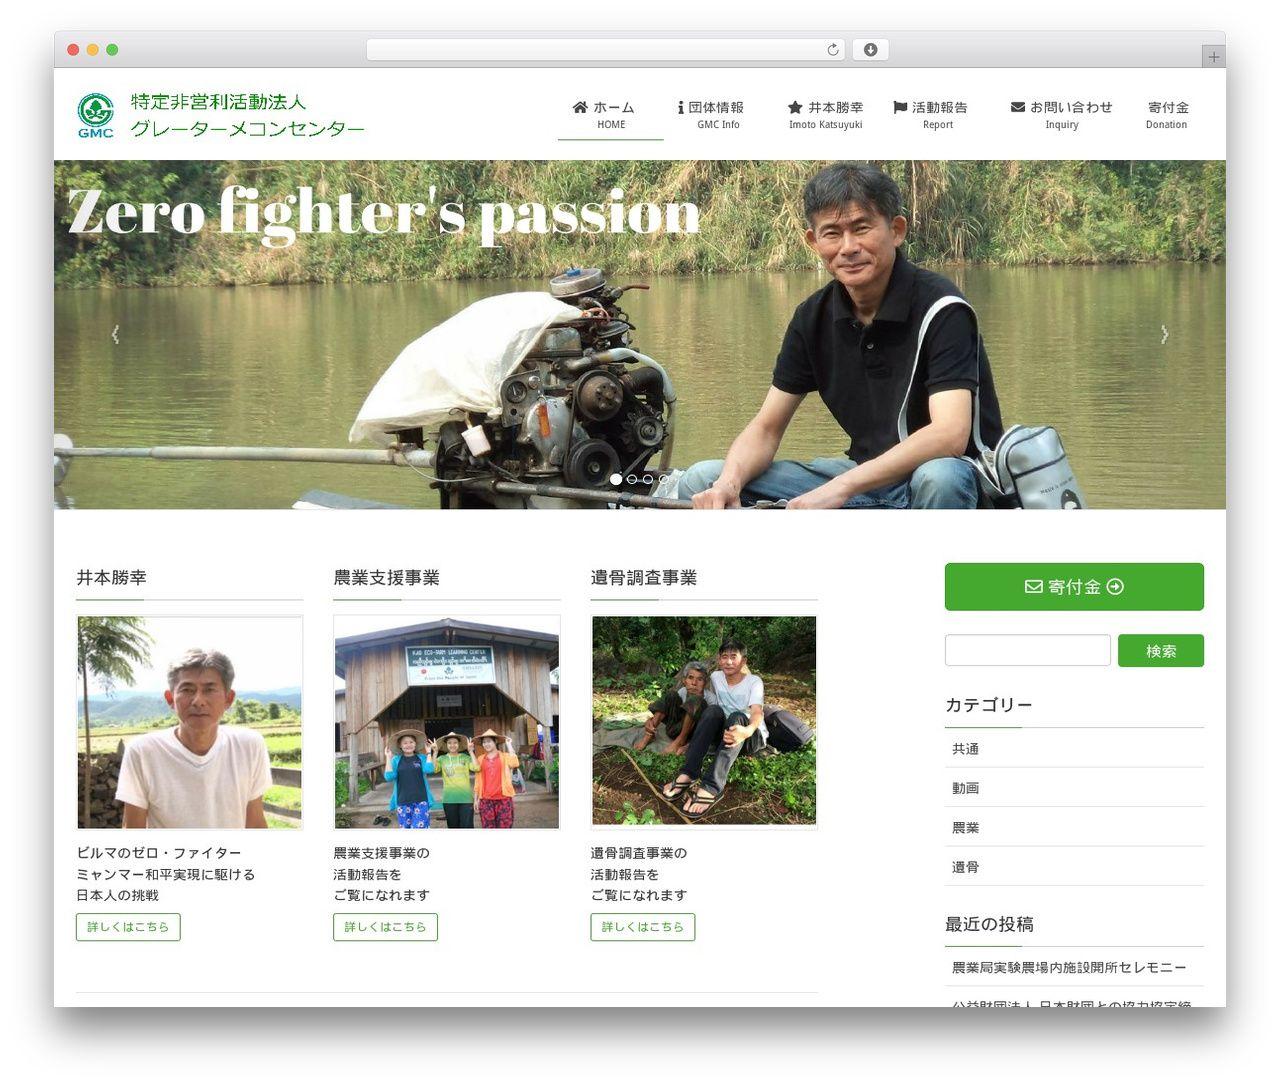 Lightning Theme Wordpress Npo Gmc Org Wordpress Theme